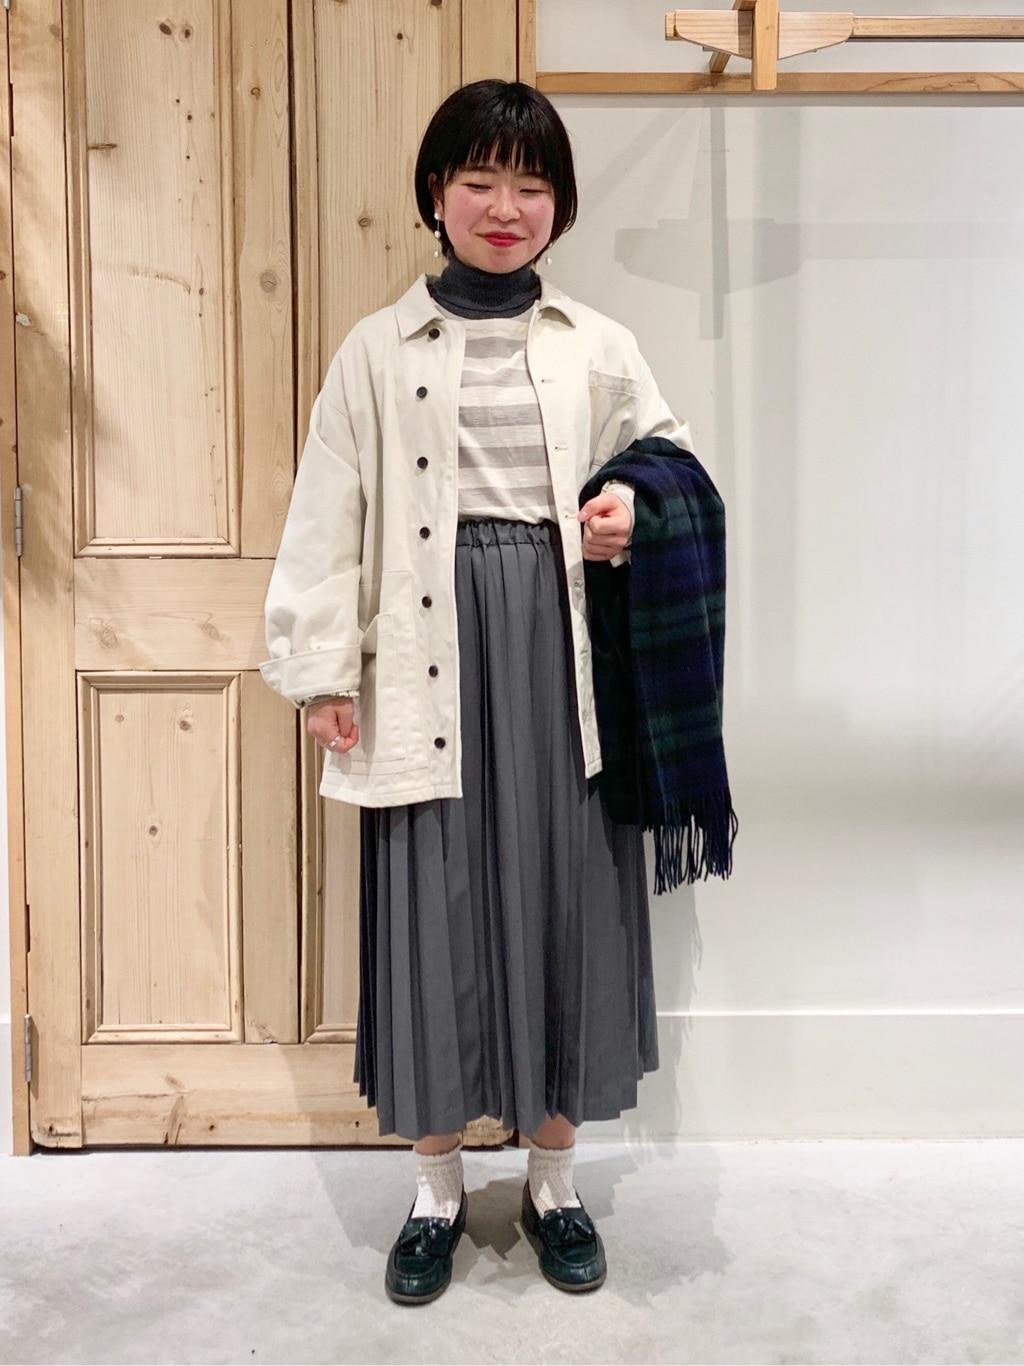 Malle chambre de charme 調布パルコ 身長:153cm 2020.11.27